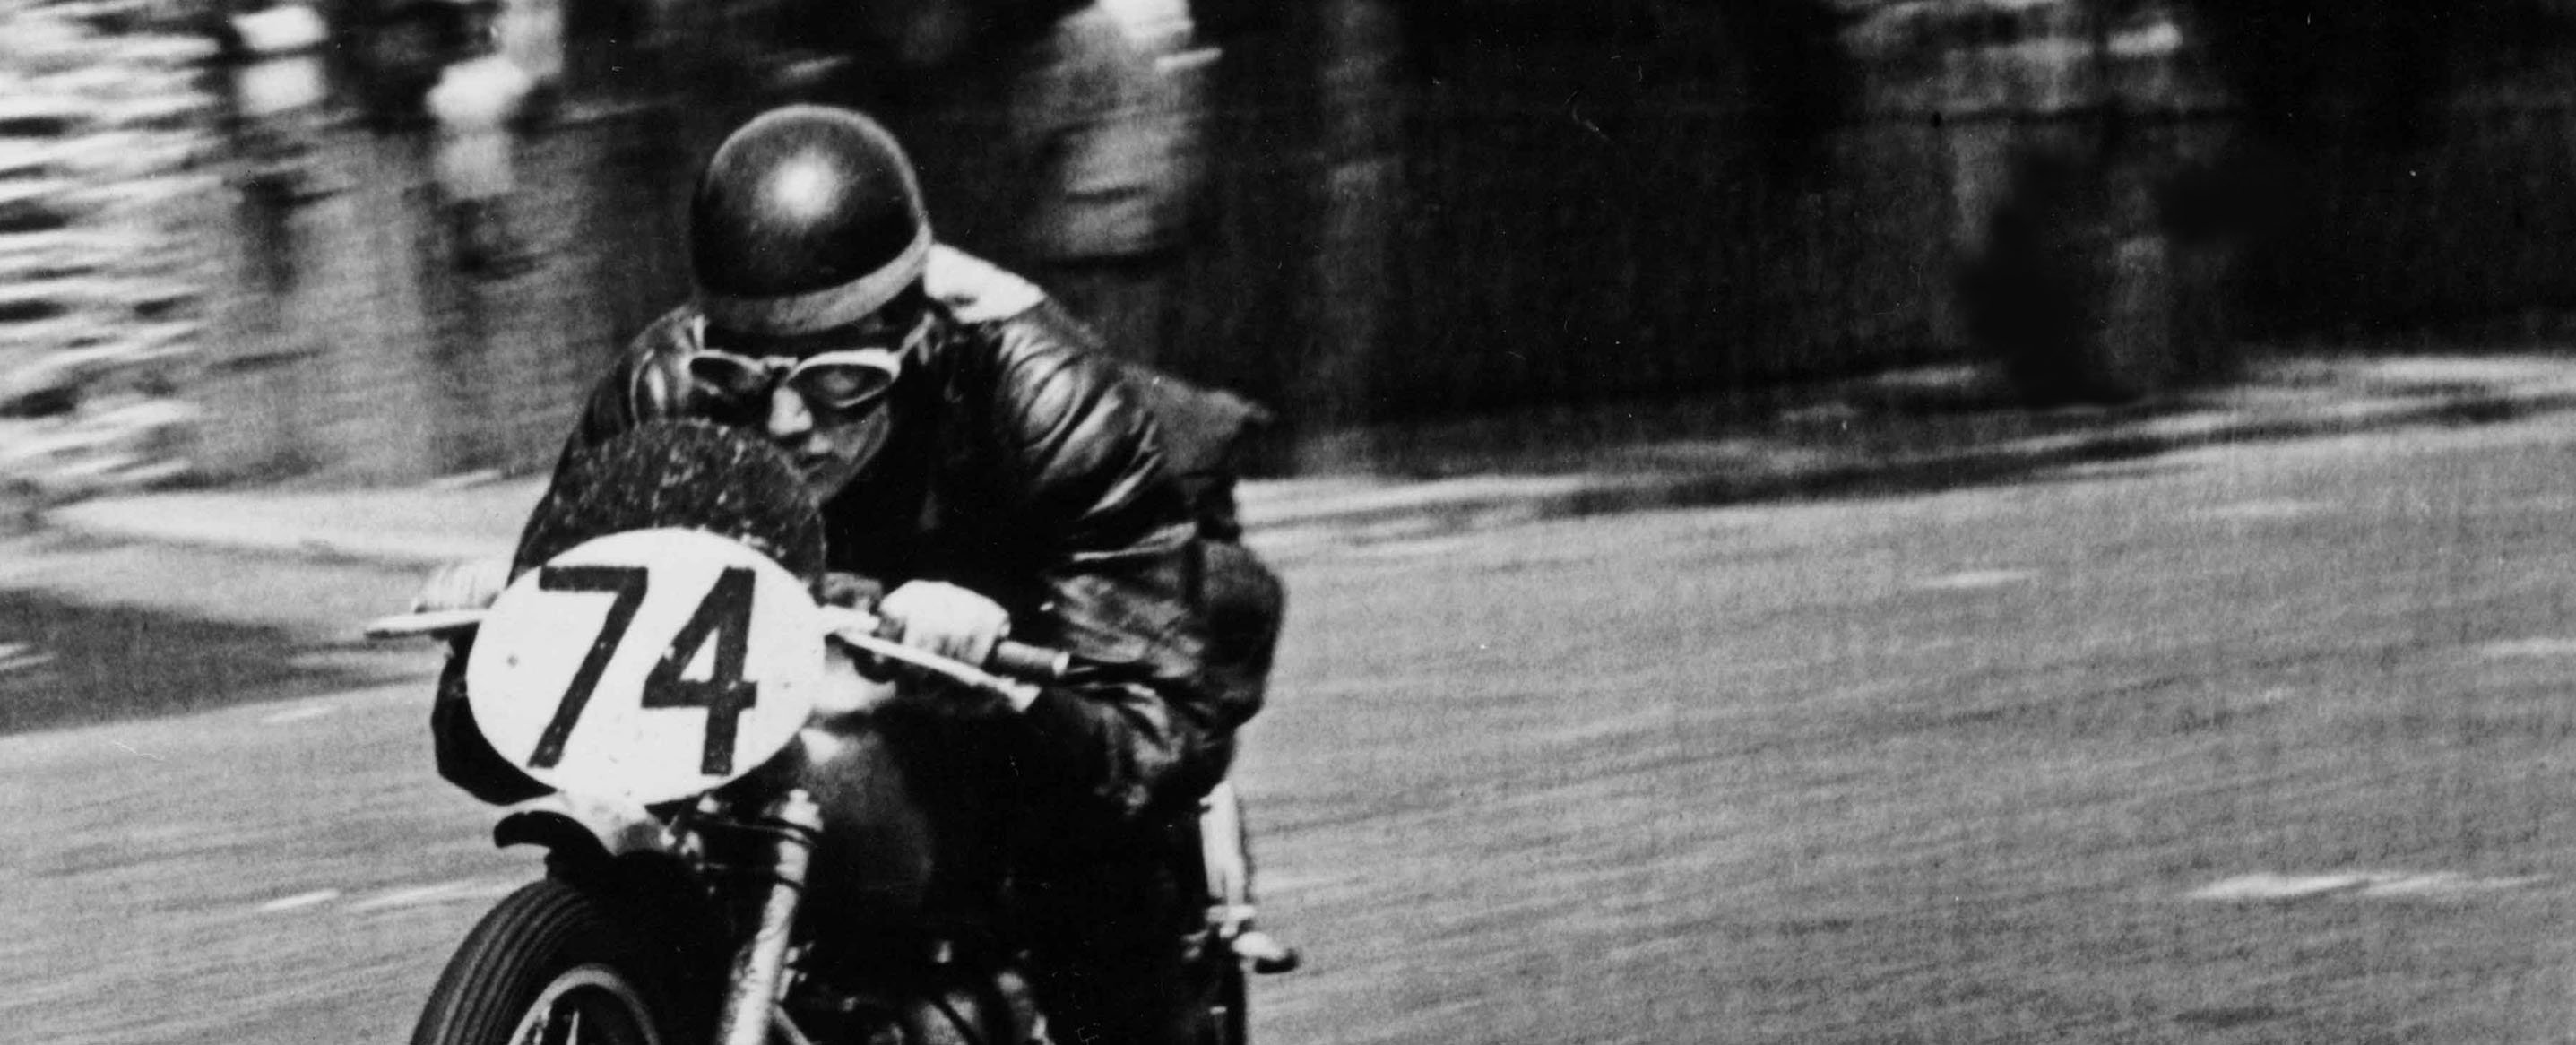 motorka, akcia, motokomplex